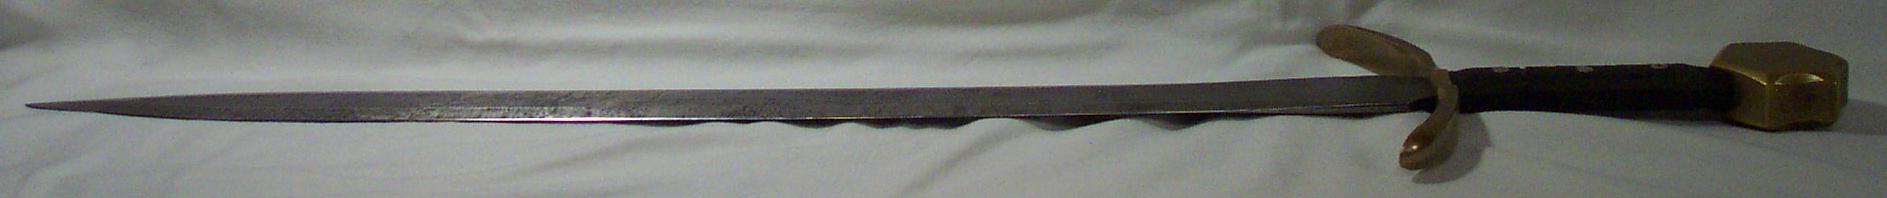 Sword 6 by Grimolfr-Stock